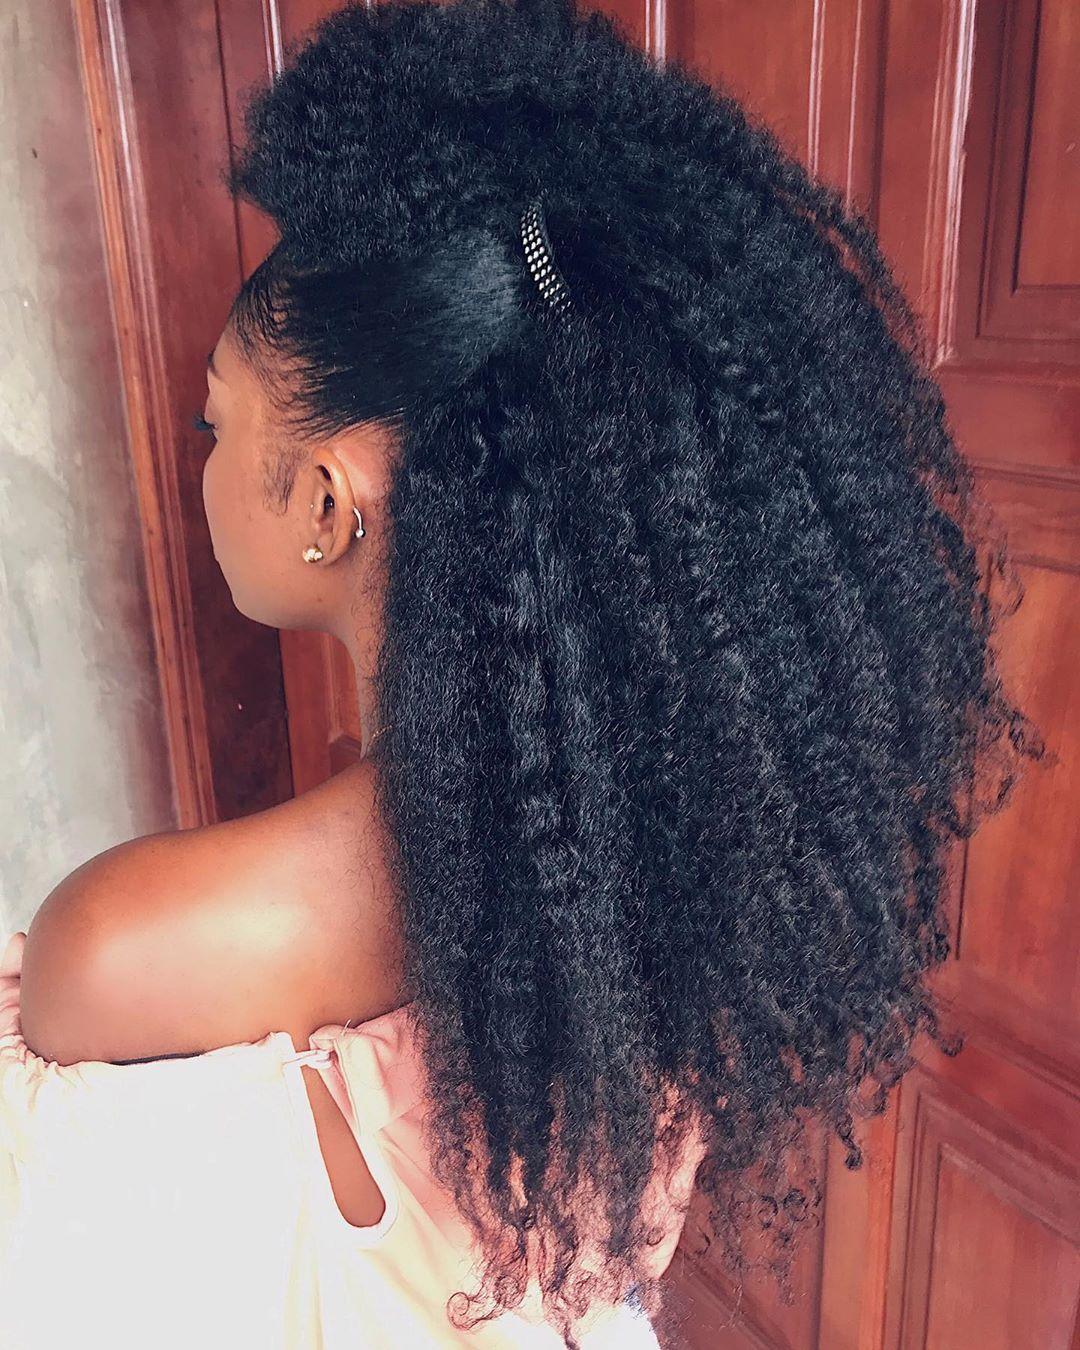 Afro Hairstyles hairstyleforblackwomen.net 13